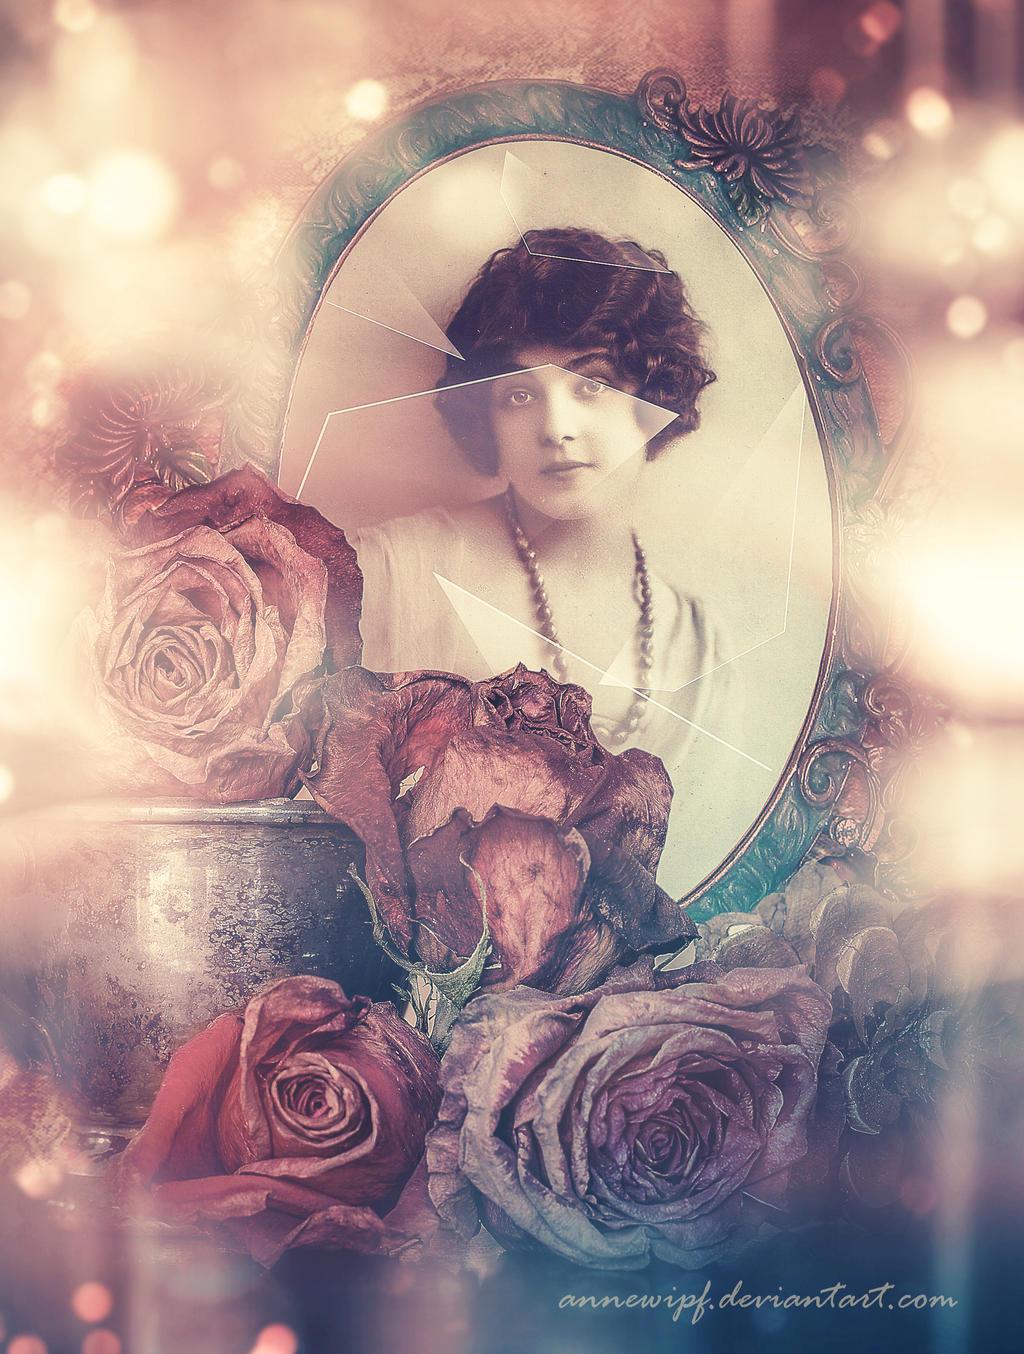 Faded Memories by annewipf